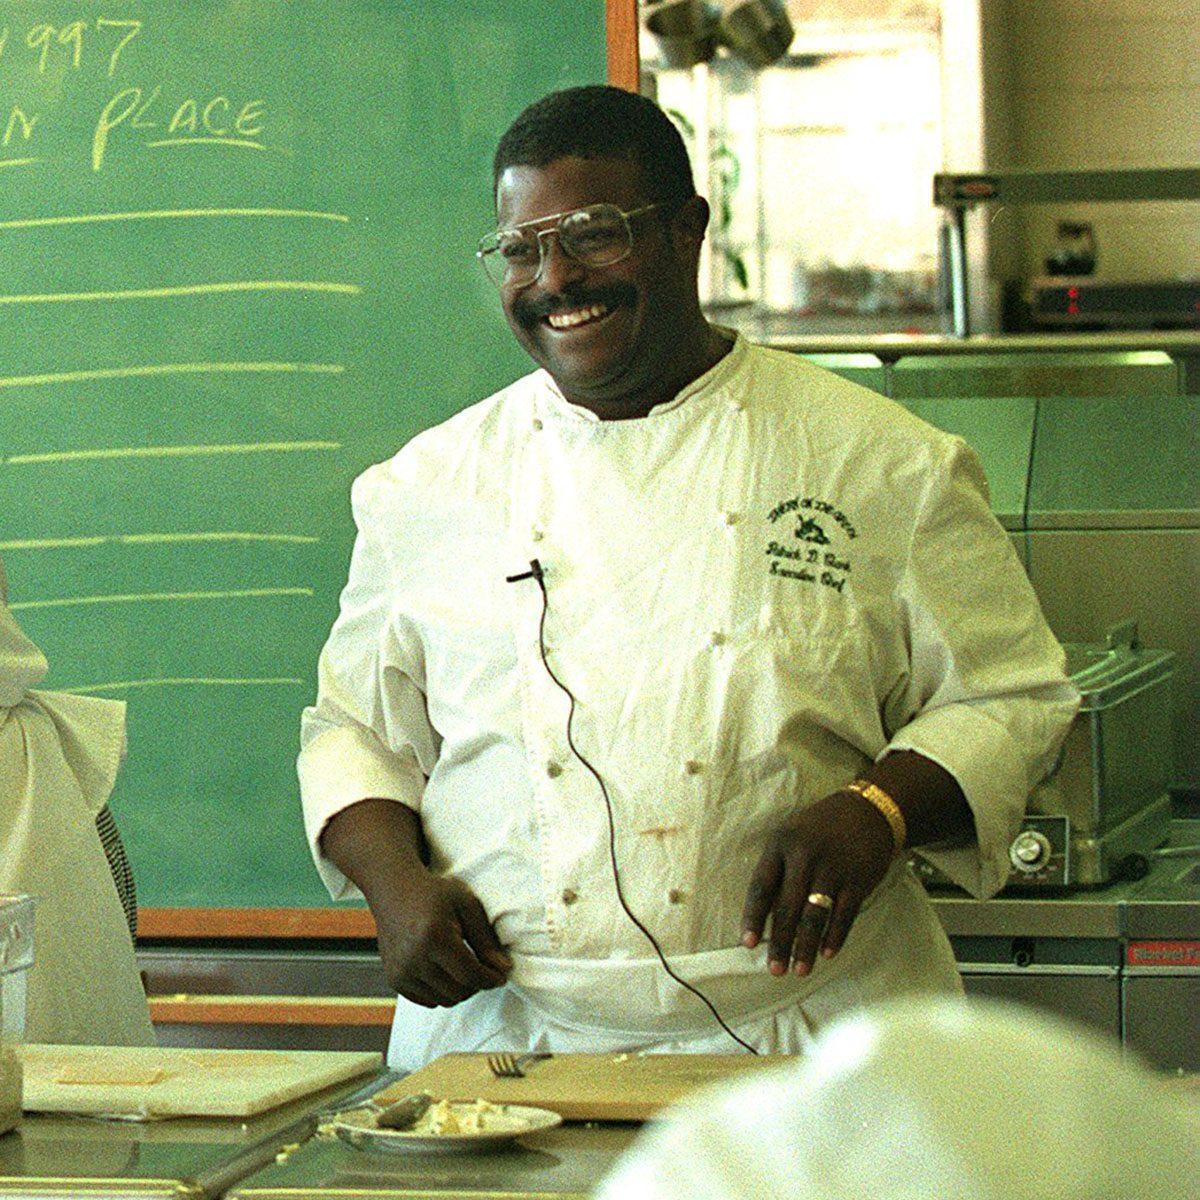 Chef Patrick Clark Teaches A Class A Madison Park H.s.